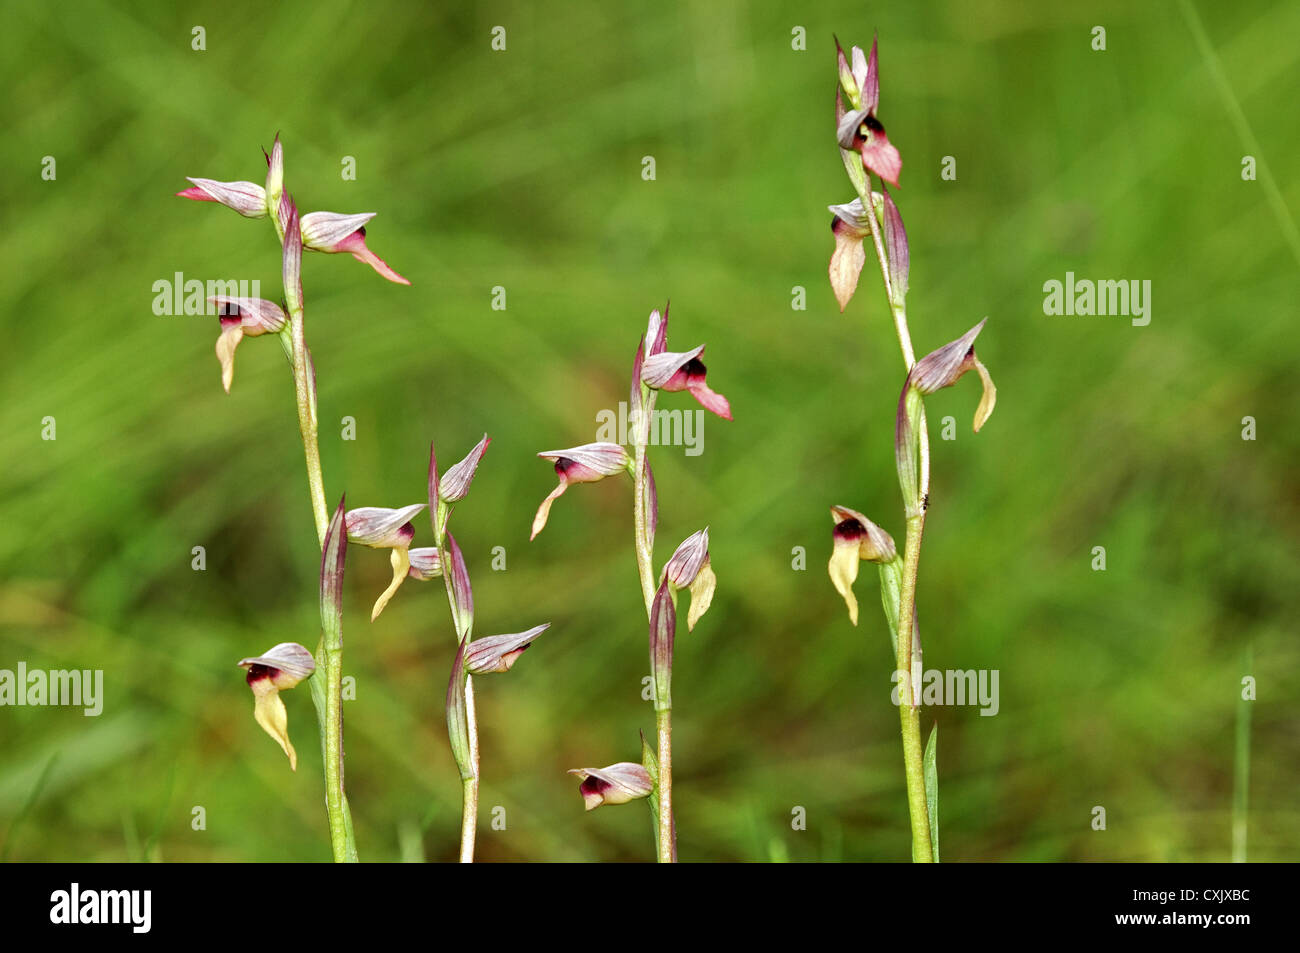 Serapias lingua, orchid - Stock Image